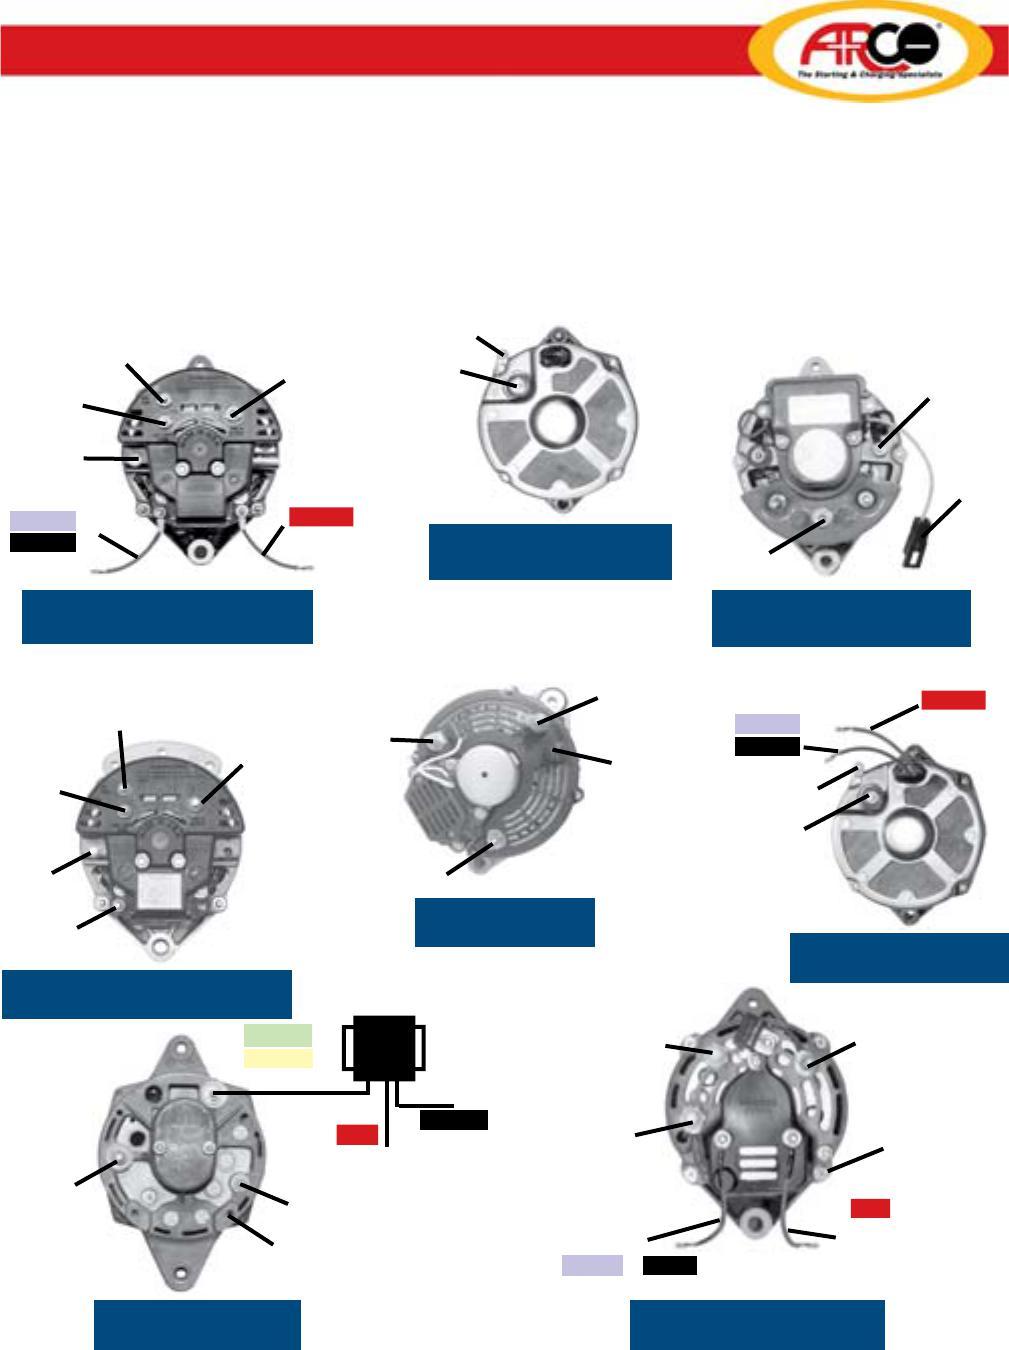 Great Gm Ls Alternator Wiring Diagram Gallery - Electrical System ...